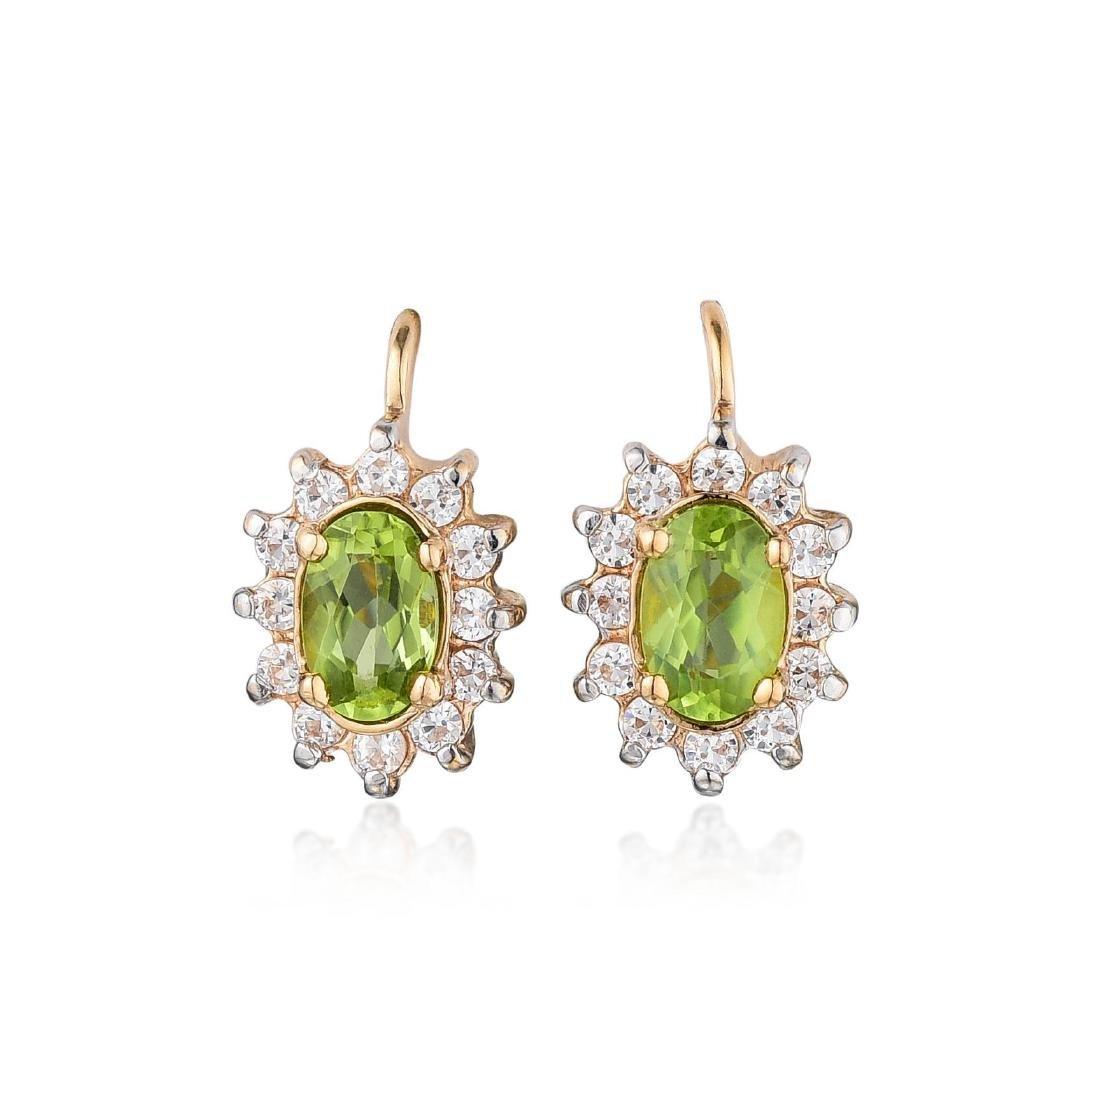 A Pair of 14K Rose Gold Peridot and Diamond Earrings,